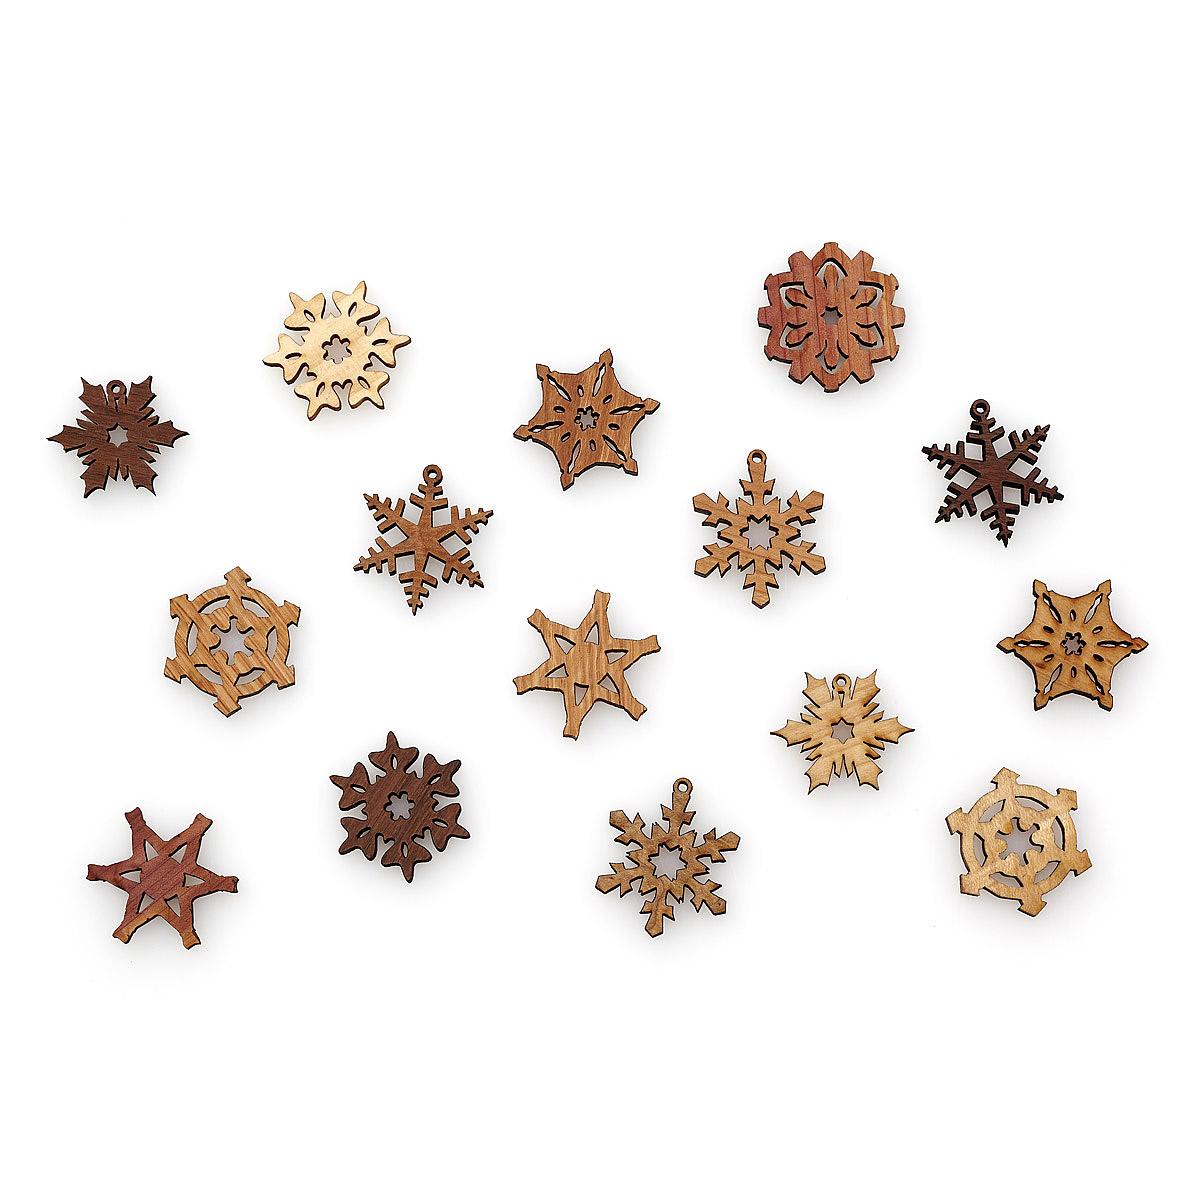 Mini Wood Snowflake Gift Box - Set of 15 1 thumbnail View Life Size Image Mini Wood Snowflake Gift Box - Set of 15